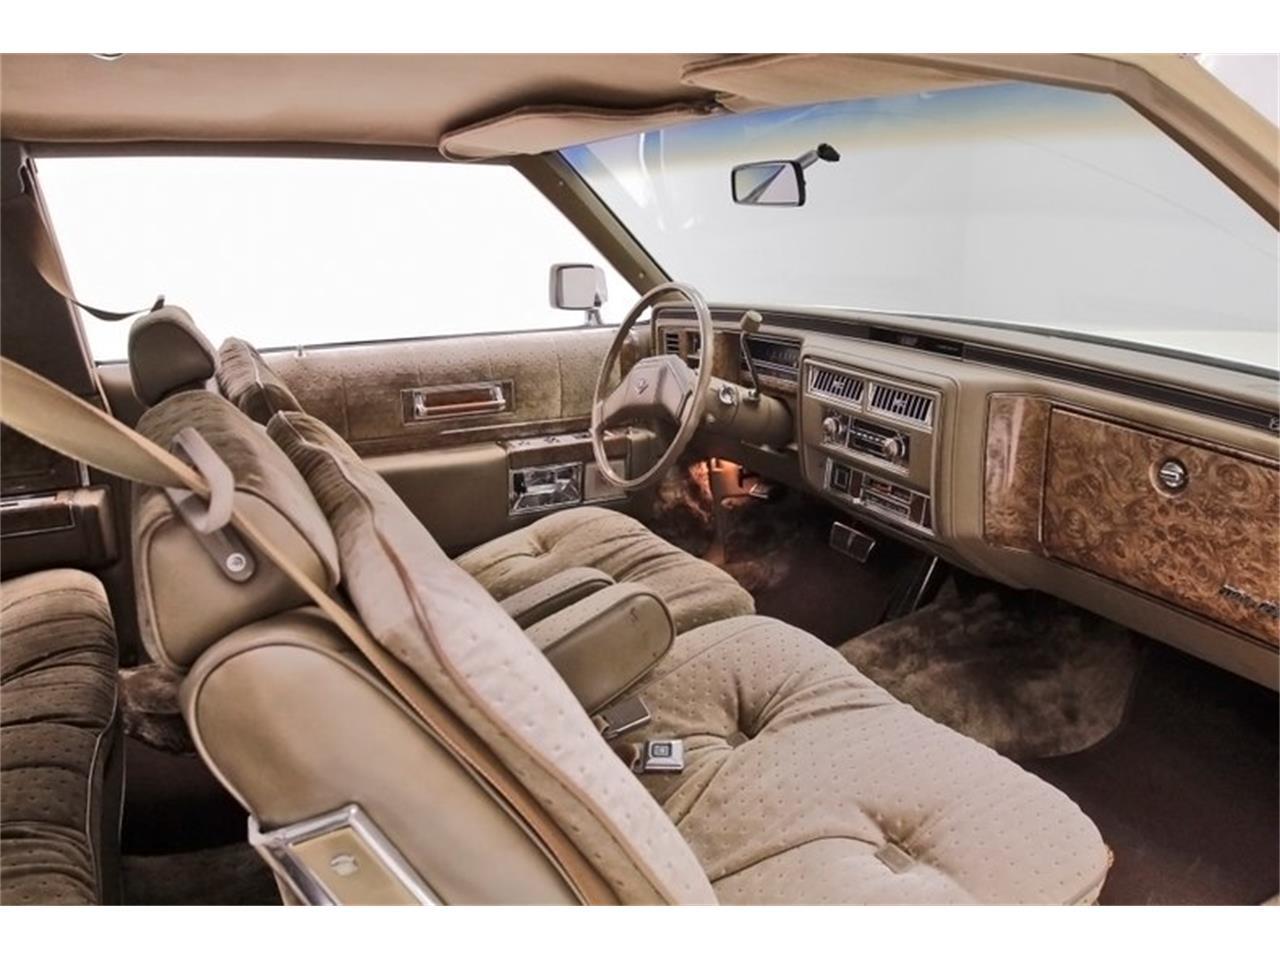 1979 Cadillac Coupe (CC-1185387) for sale in Morgantown, Pennsylvania